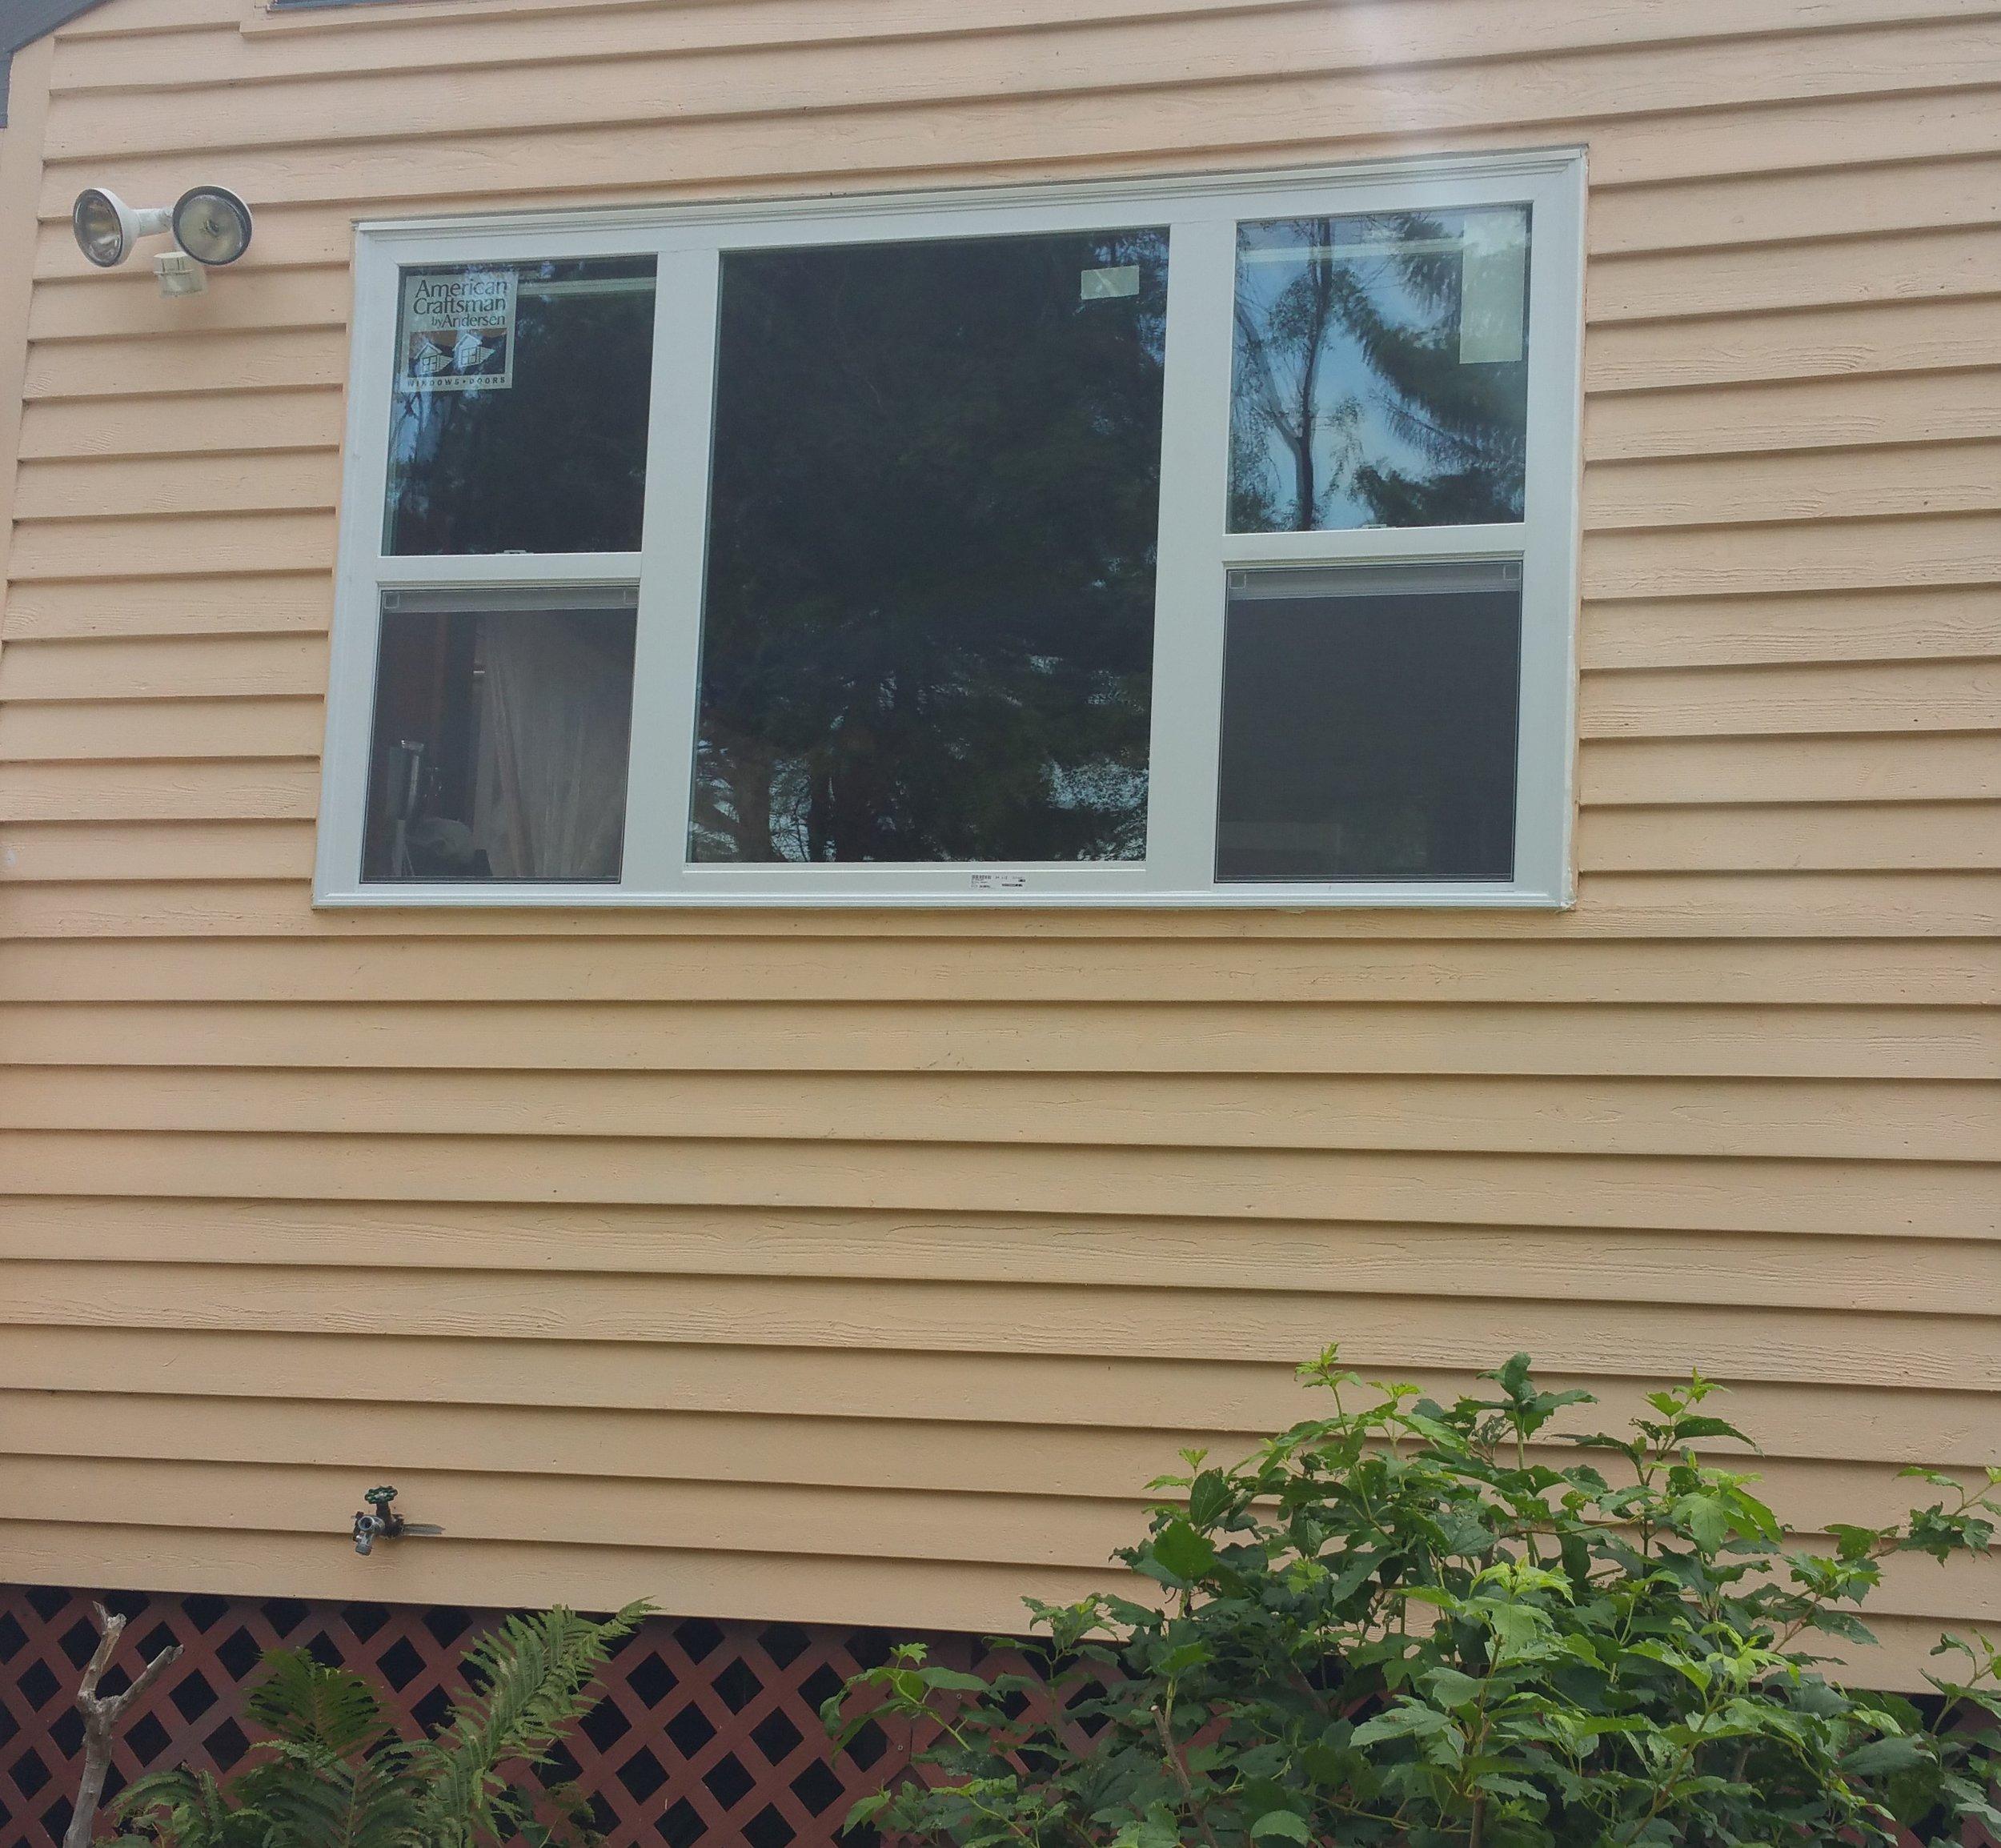 bitz-exteriors-anderson-window-installation.jpg